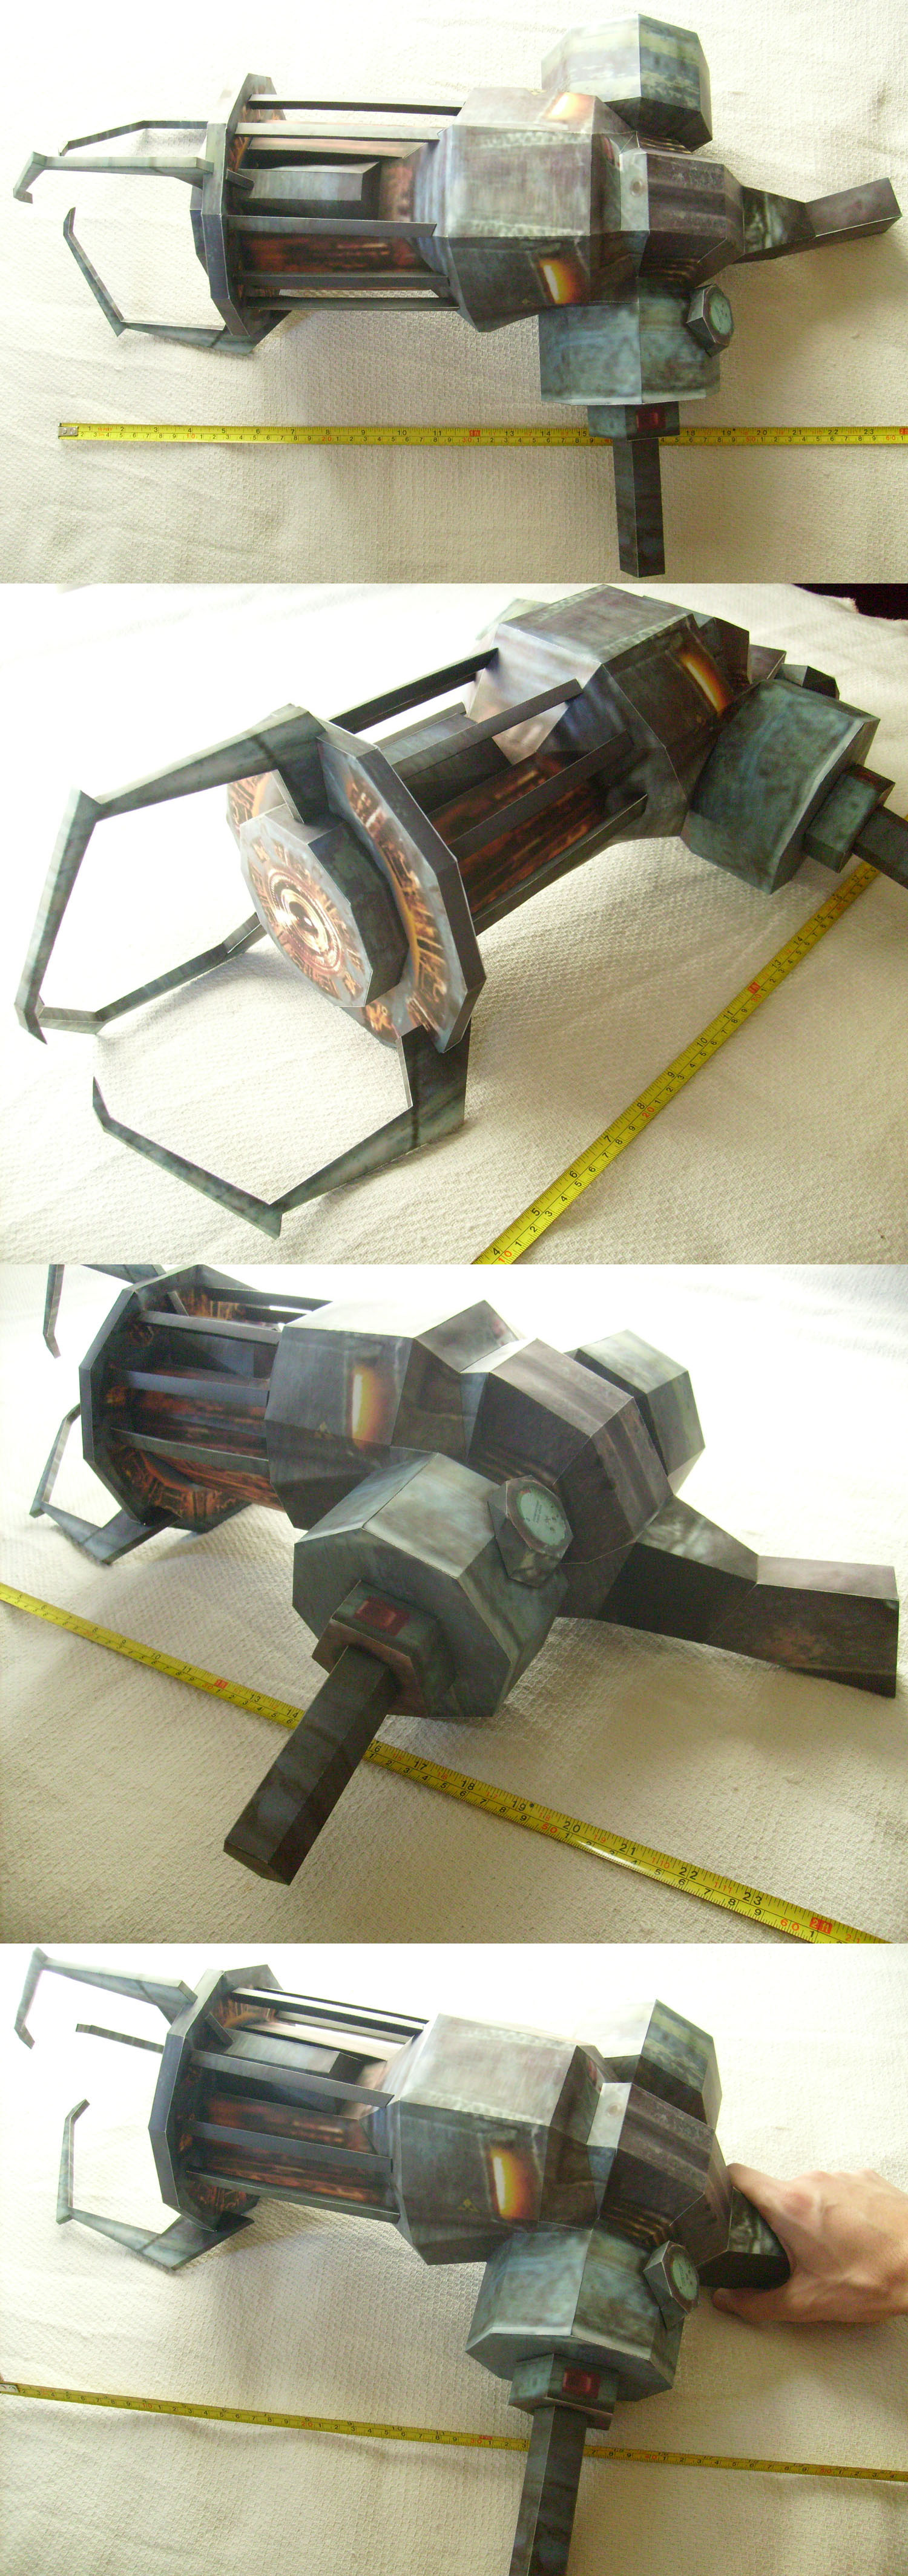 HL Gravity Gun - Life Size Papercraft - Assembled by dvntusr